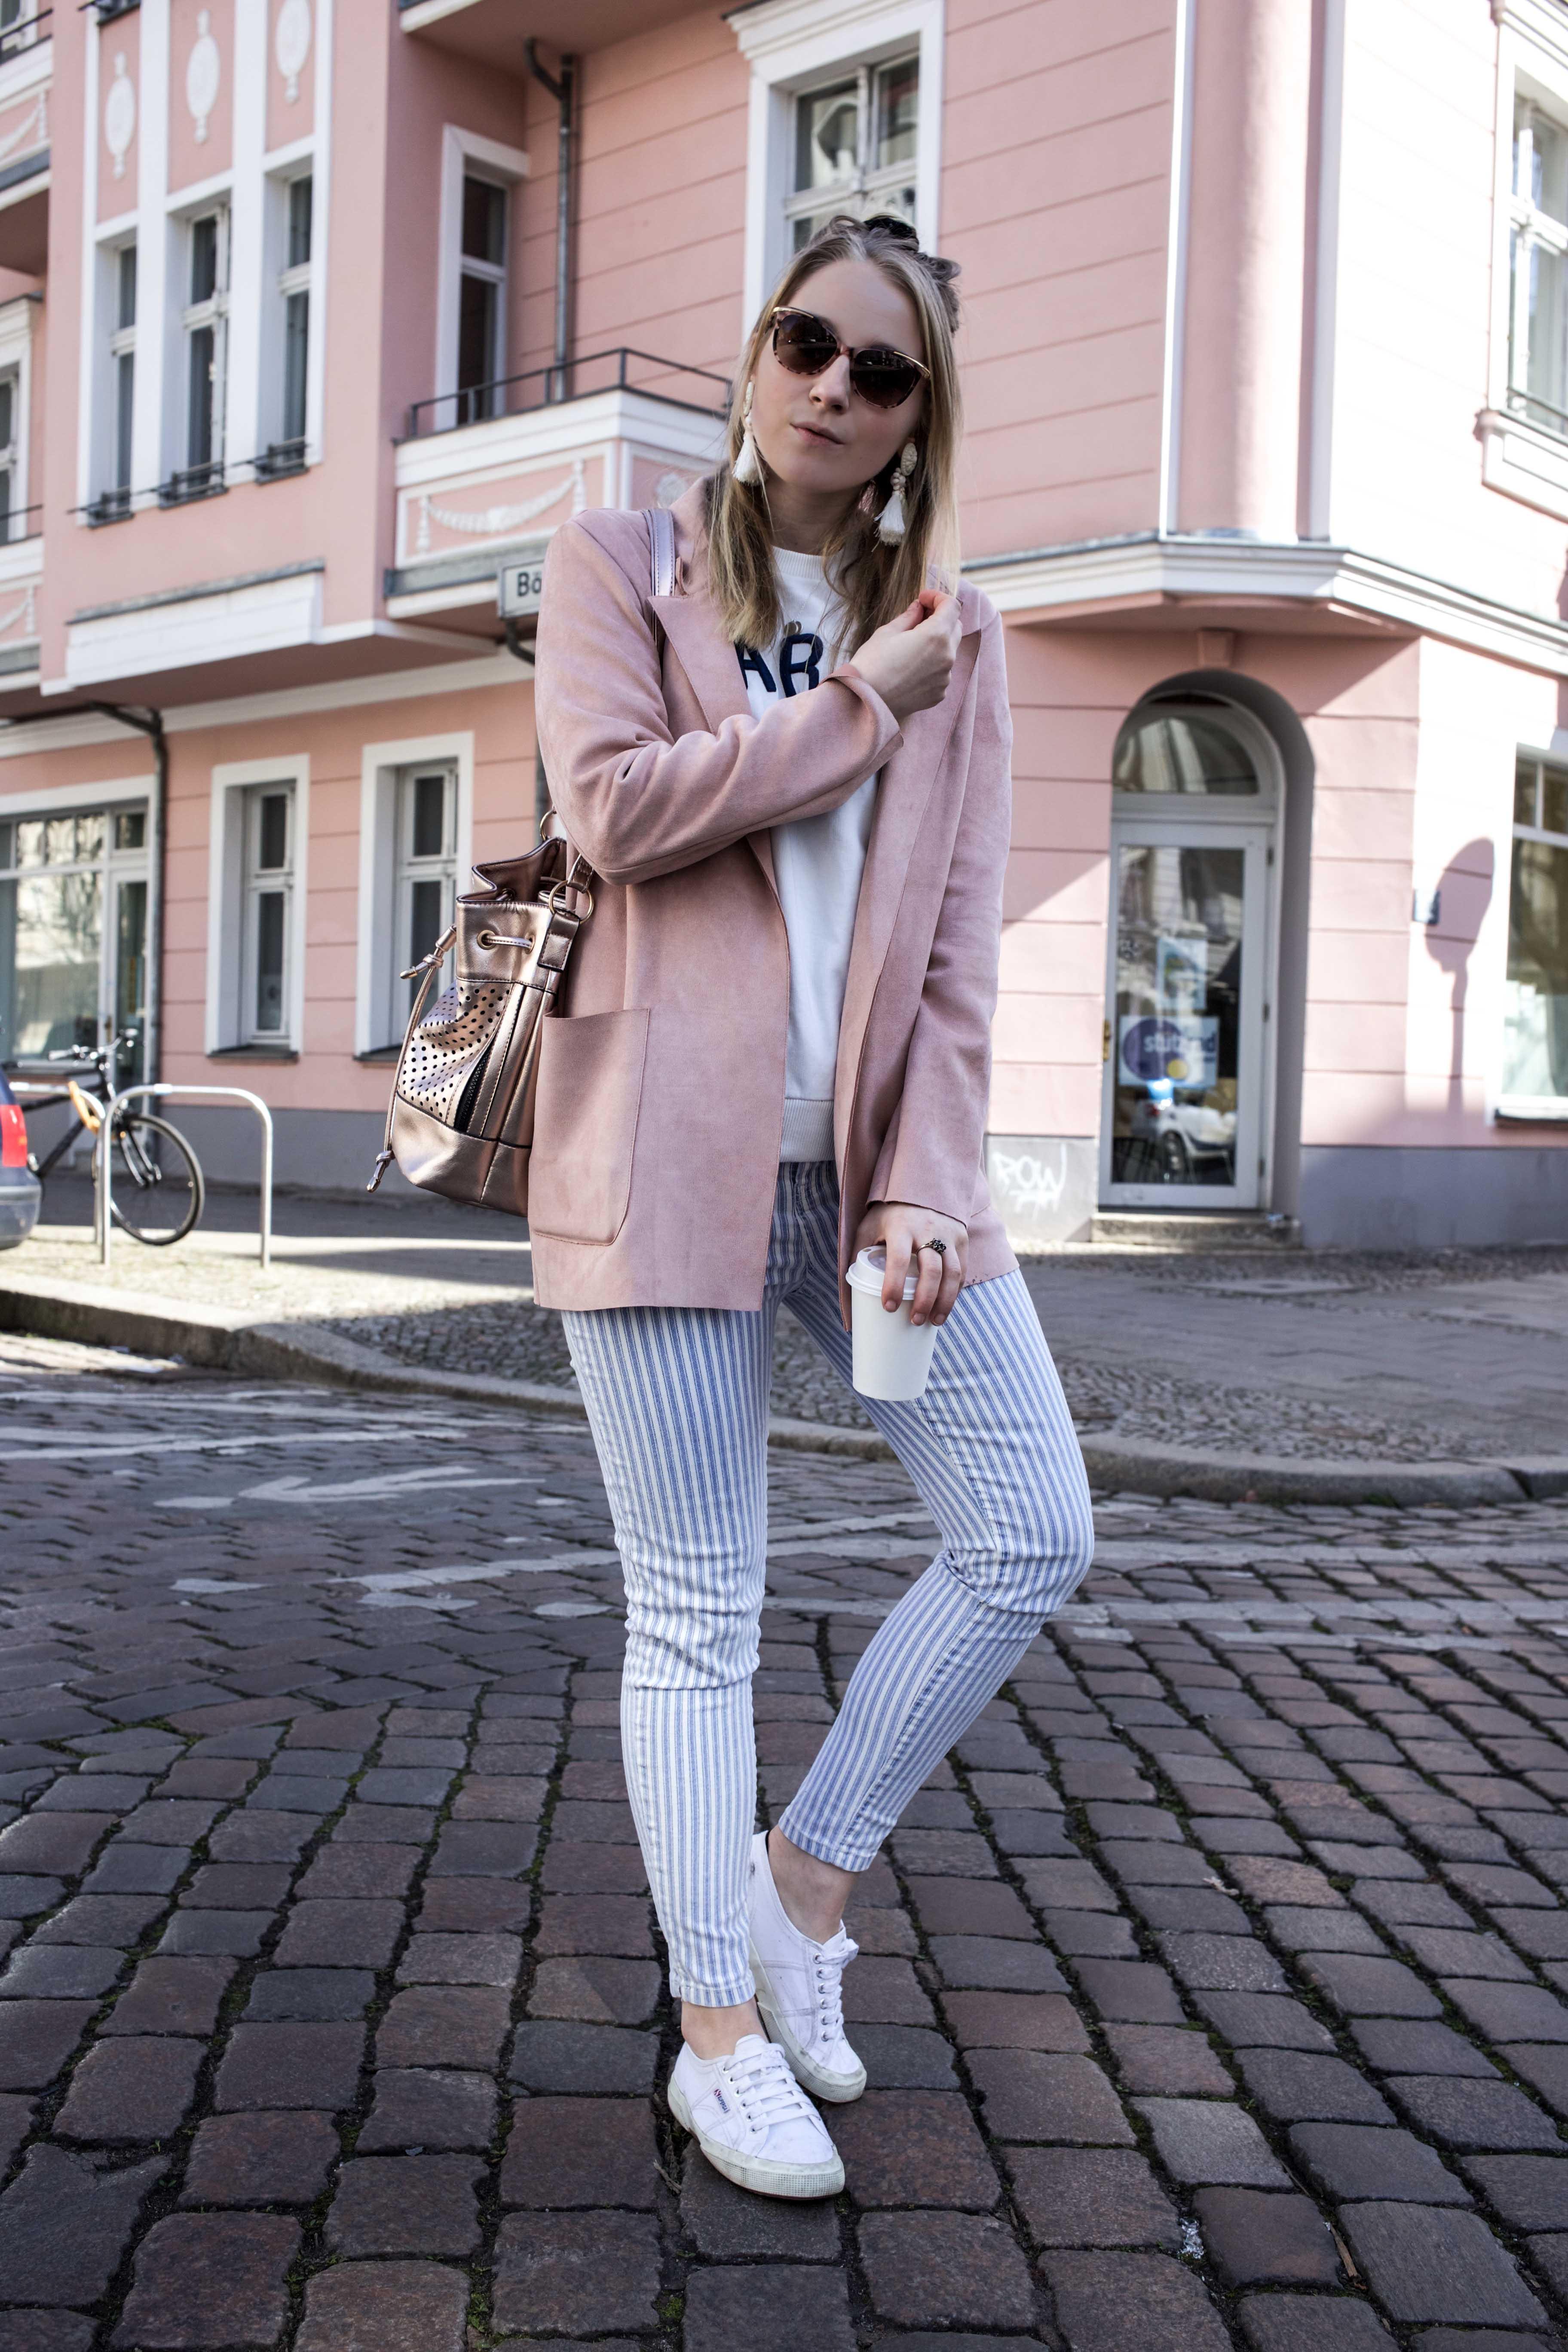 spring-look-frühlingsoutfit-rosegold-rosa-gestreifte-jeans-prenzlauer-berg_5127